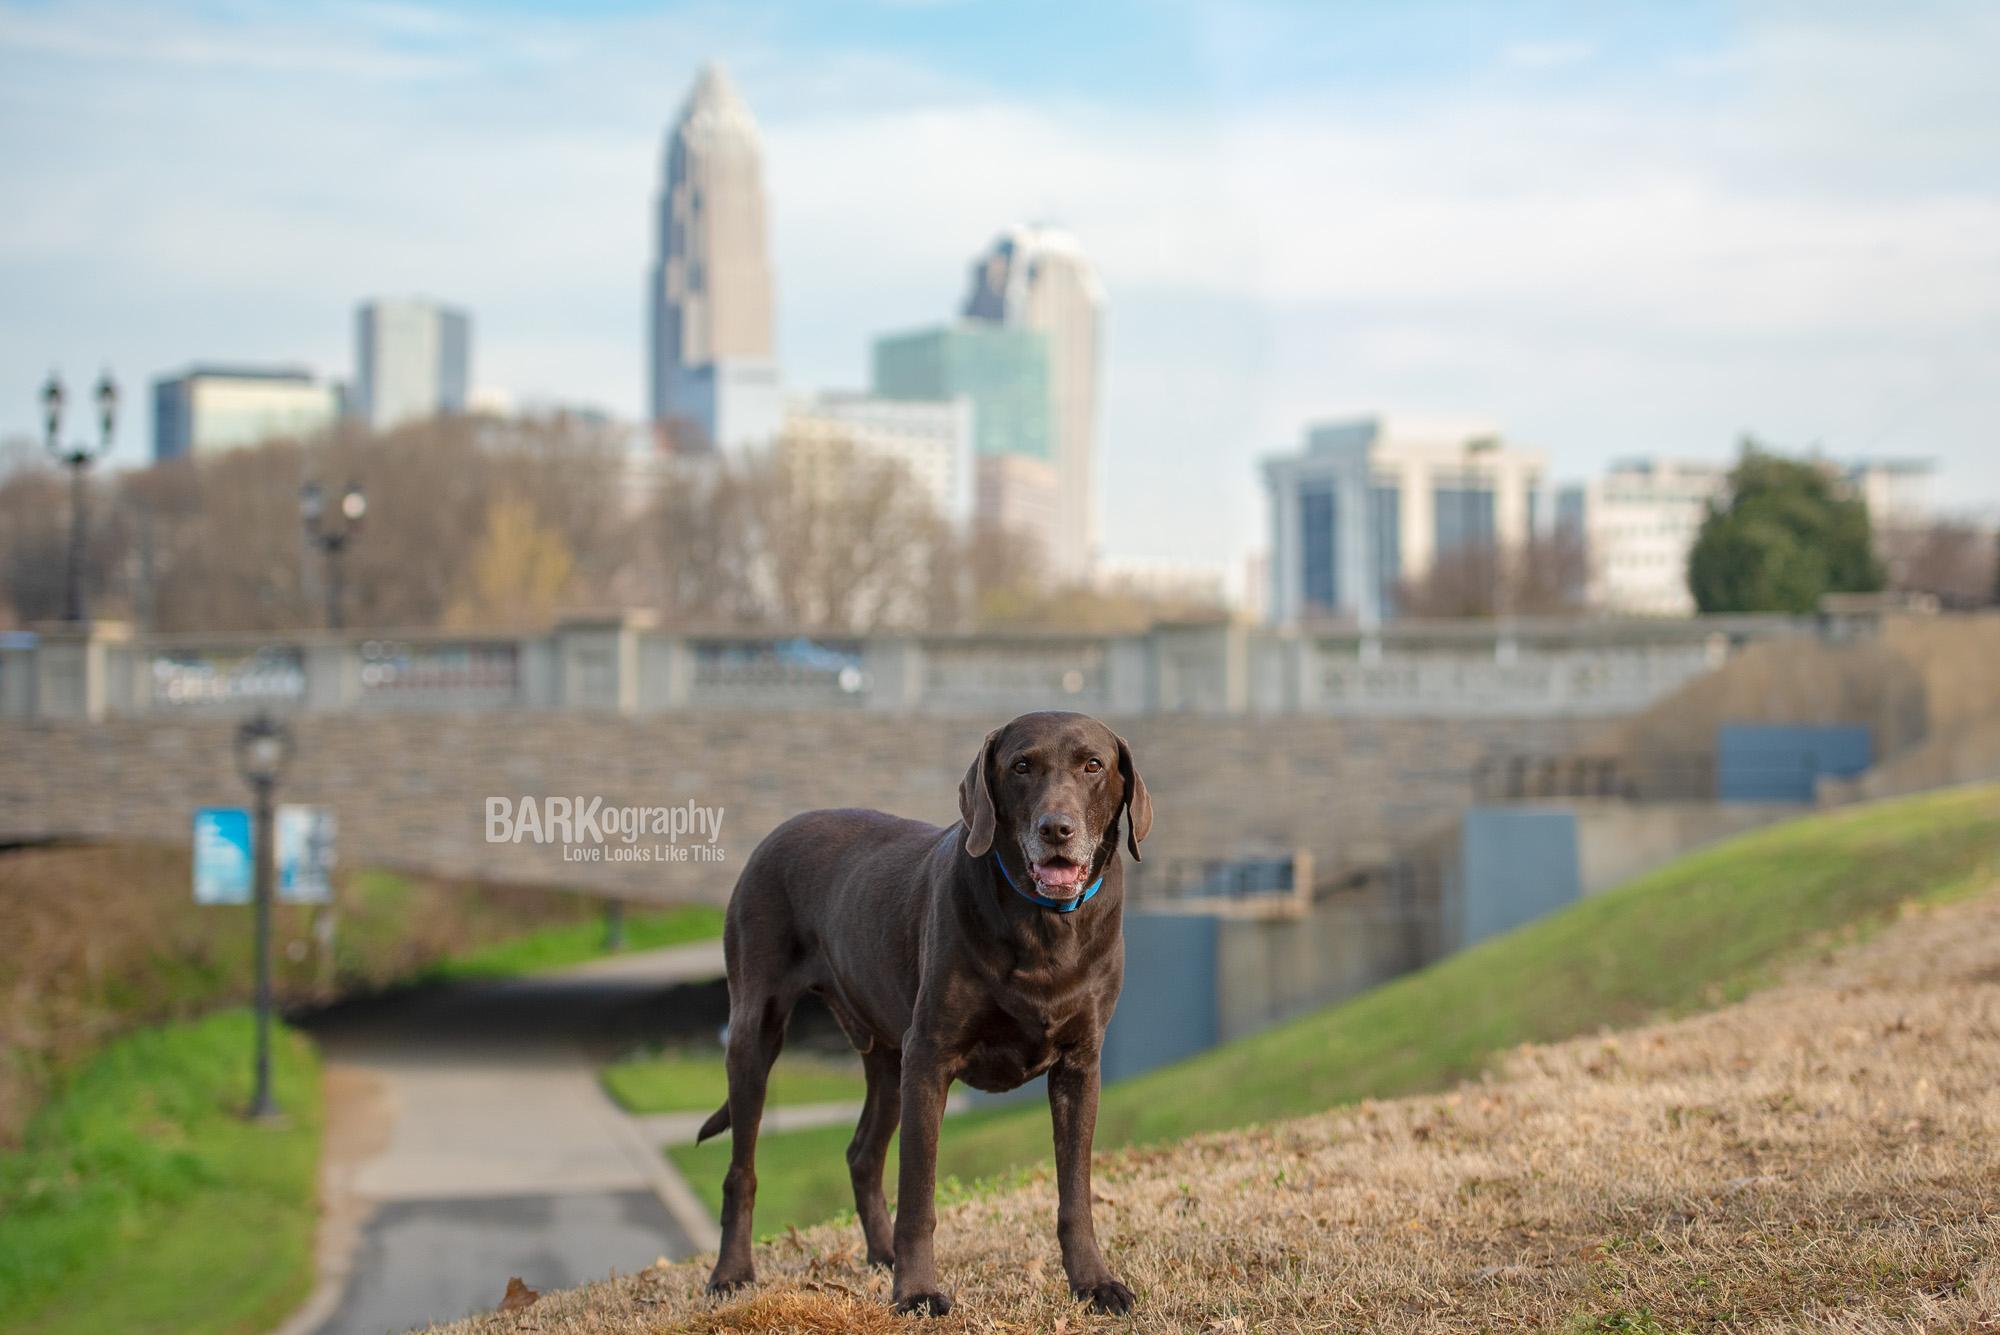 dog photo Charlotte NC uptown skyline background